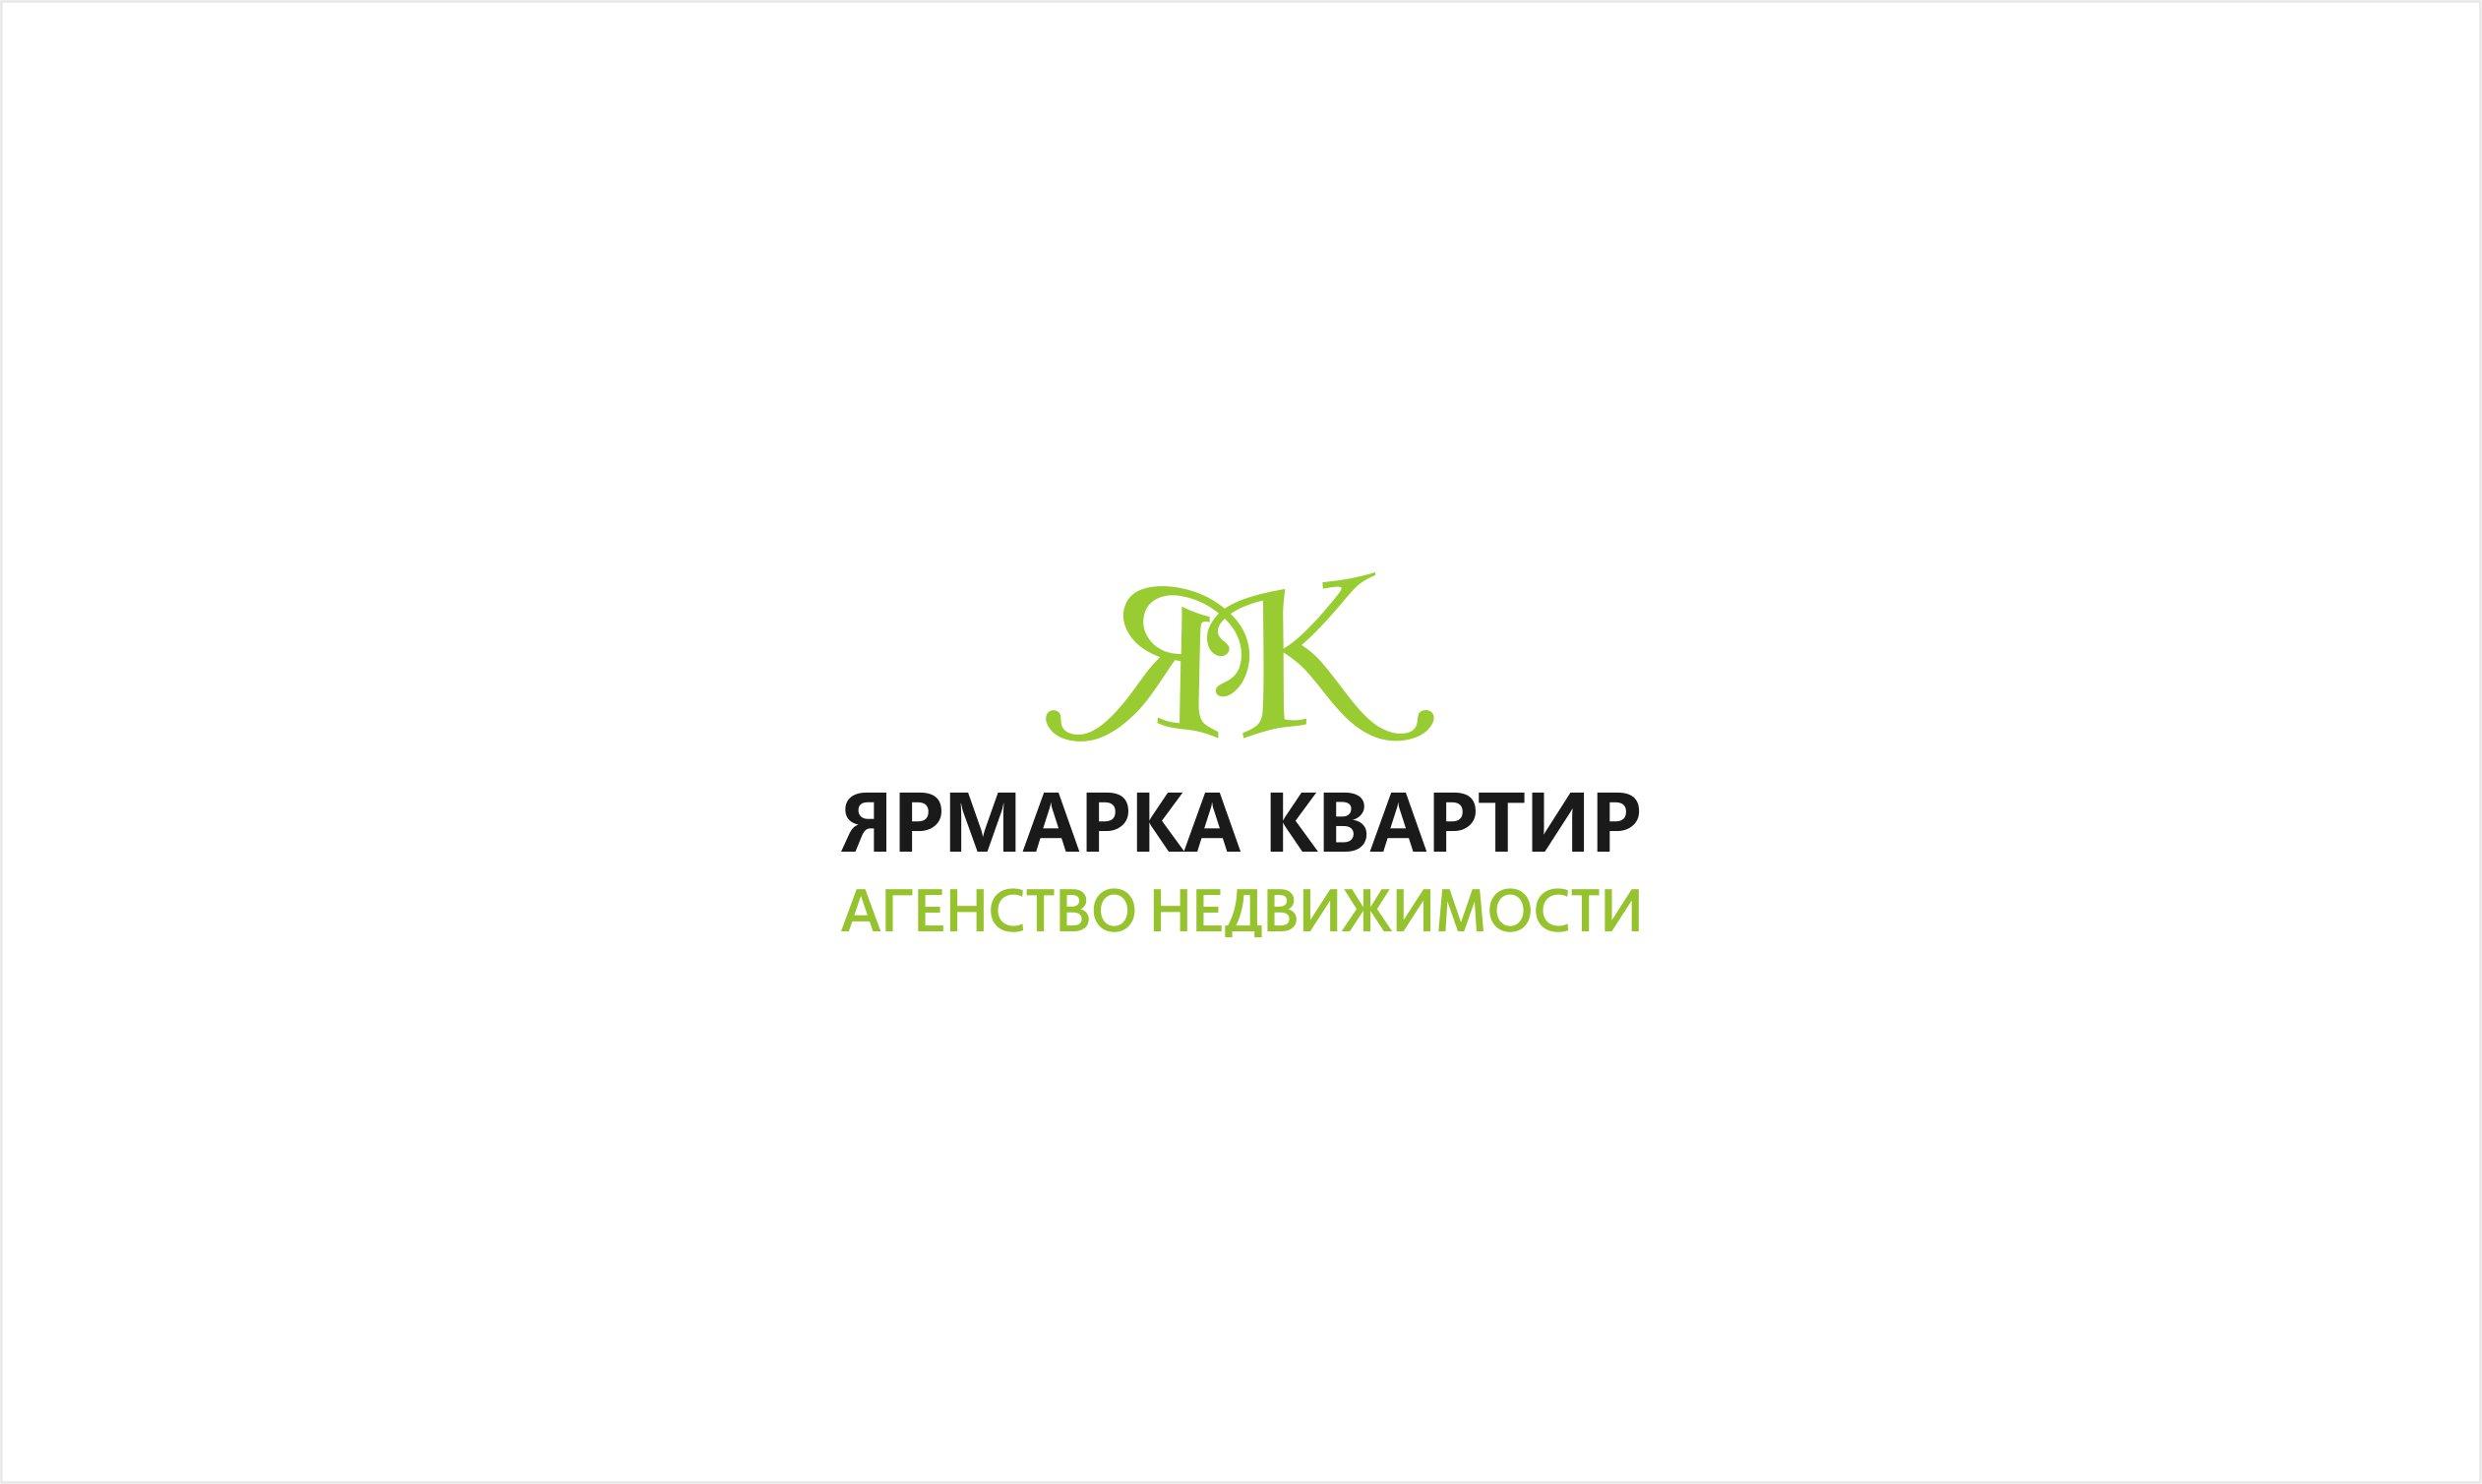 Создание логотипа, с вариантами для визитки и листовки фото f_167600b3a131a84f.jpg